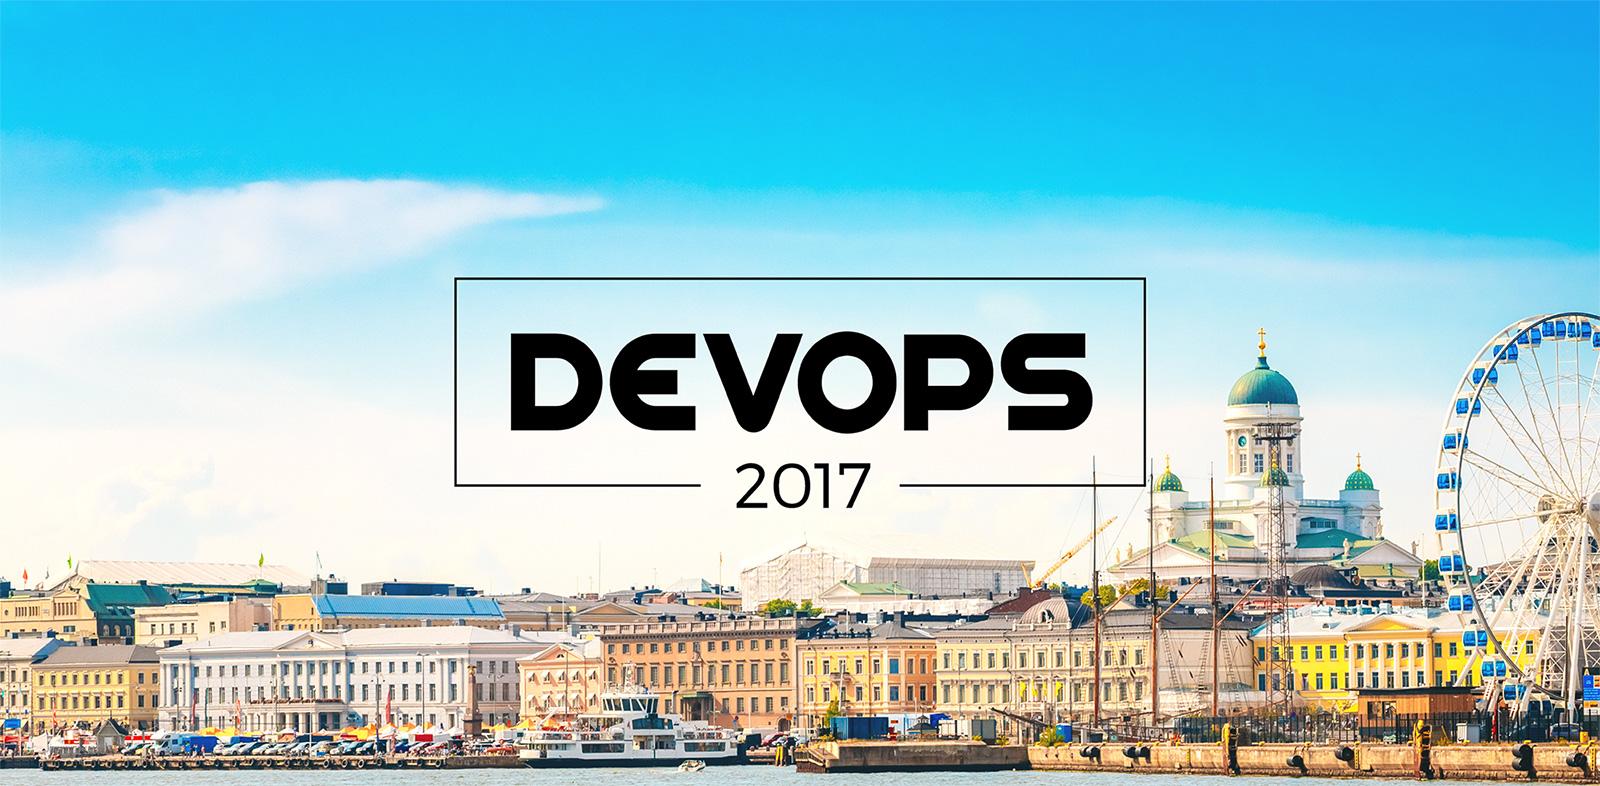 2017-04-27: DevOps 2017 Conference, Helsinki